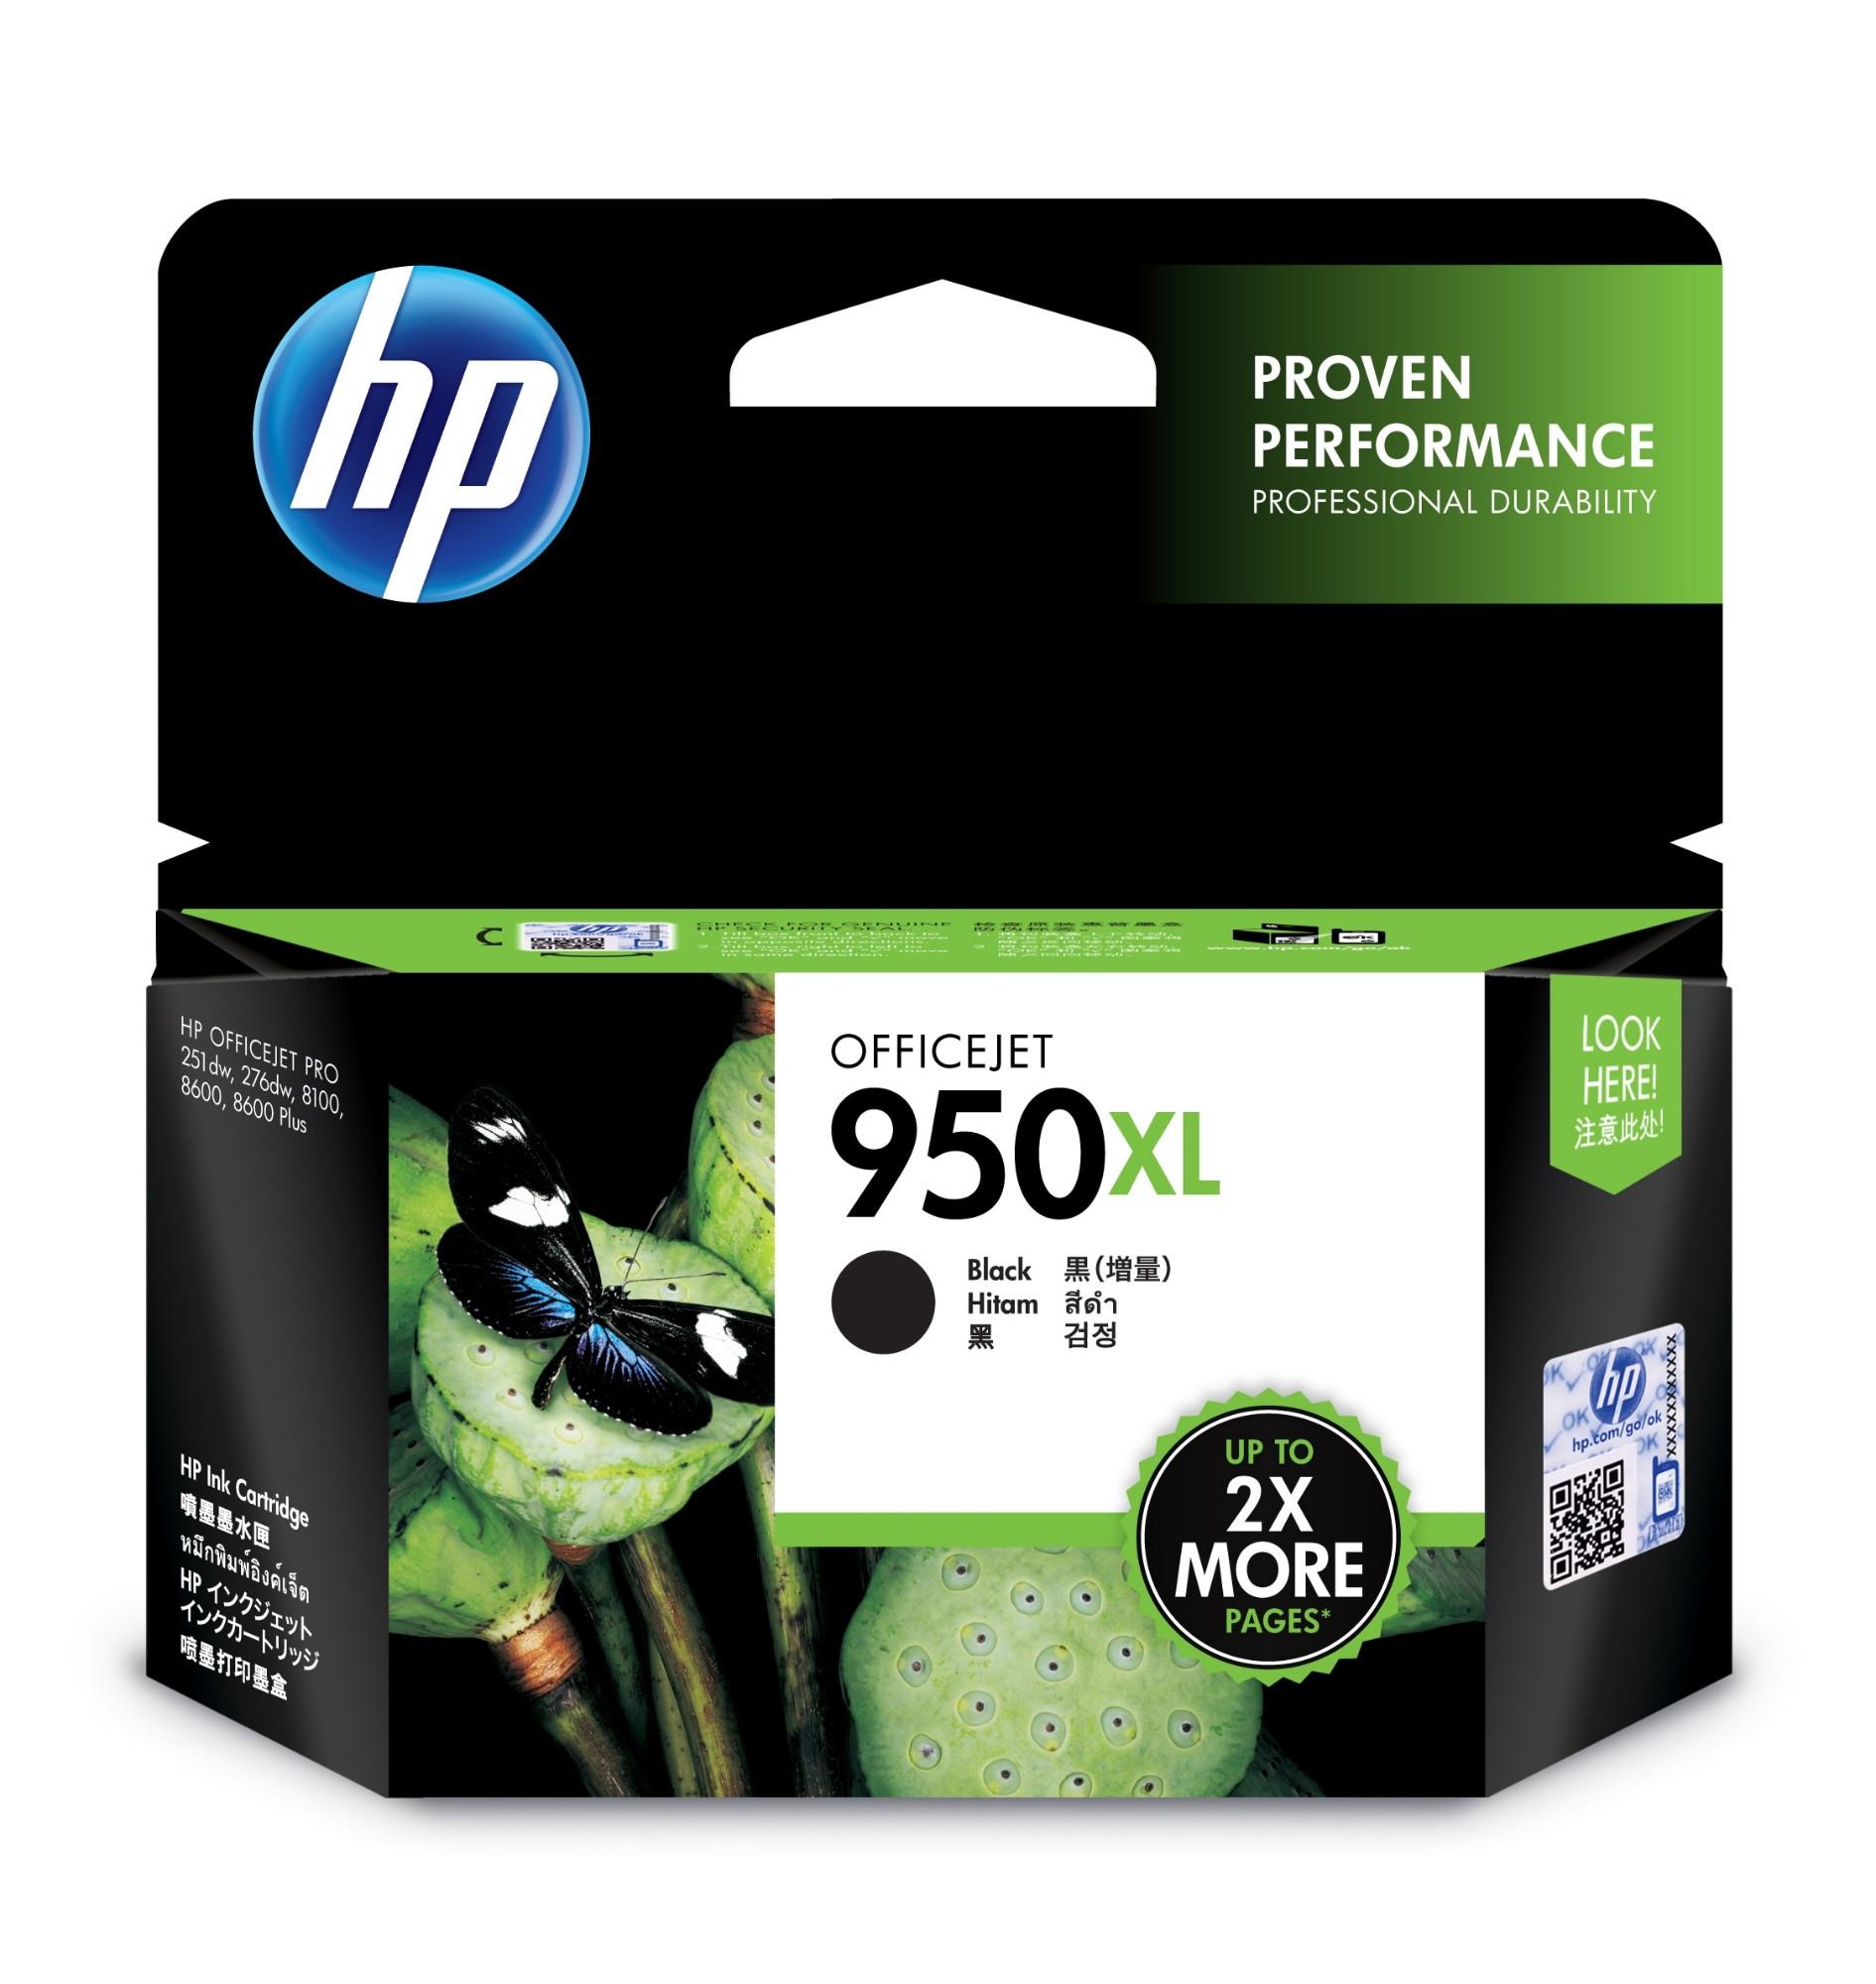 HP CN045AE (950XL) Ink cartridge black, 2.3K pages, 53ml